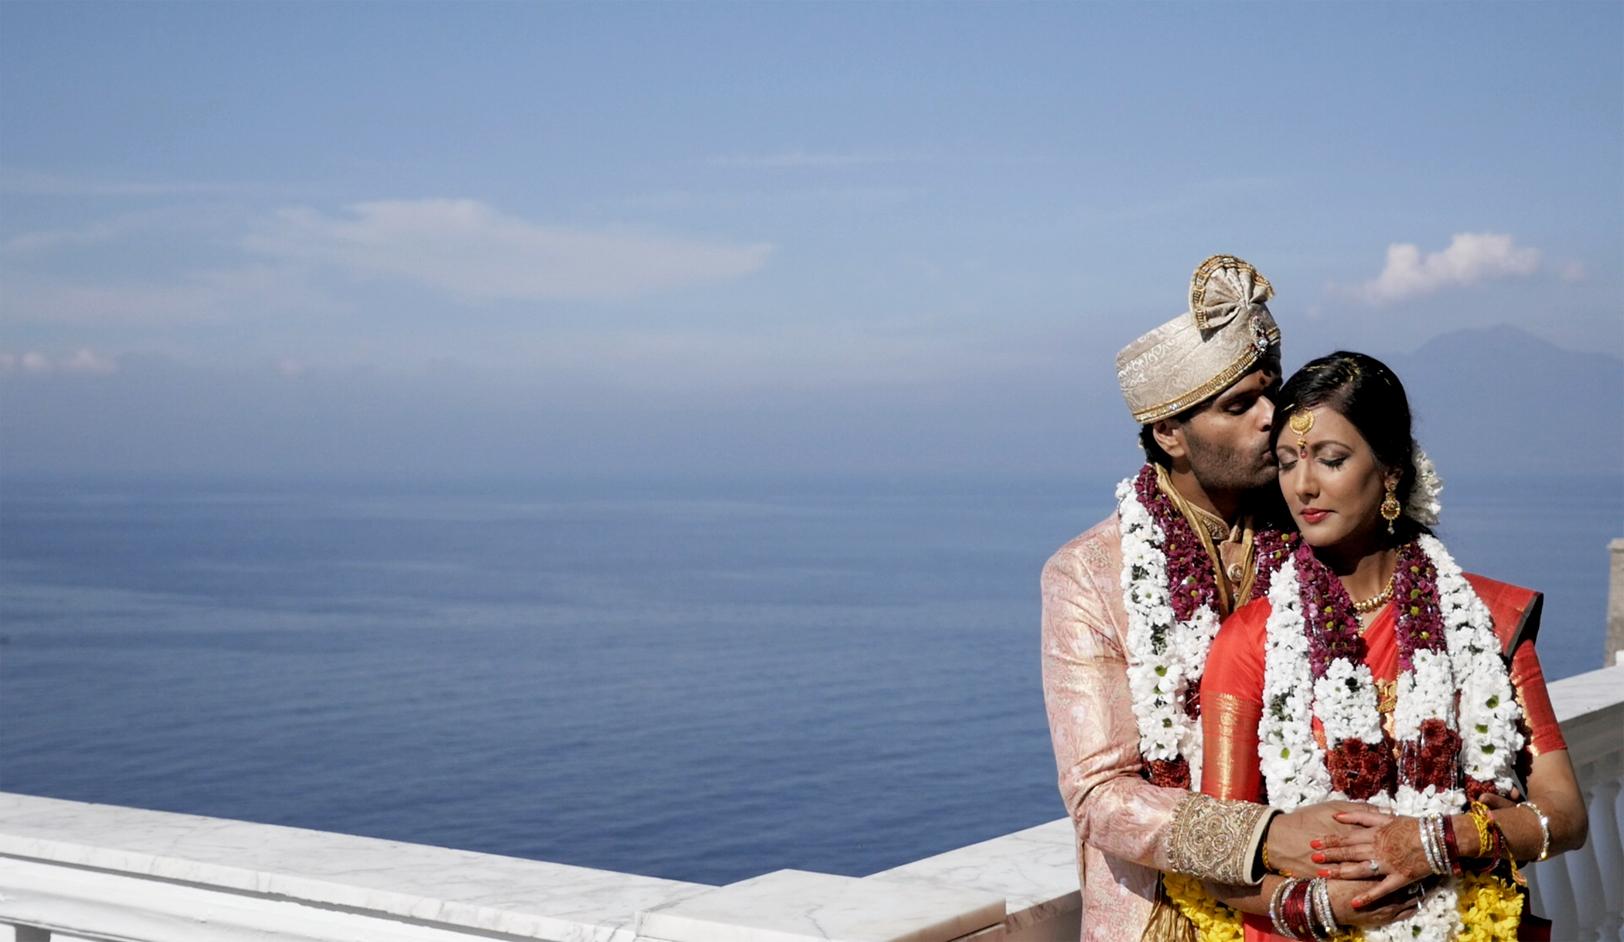 matrimonio-indiano-hotel-cocumella-sorrento-amalfi.jpg